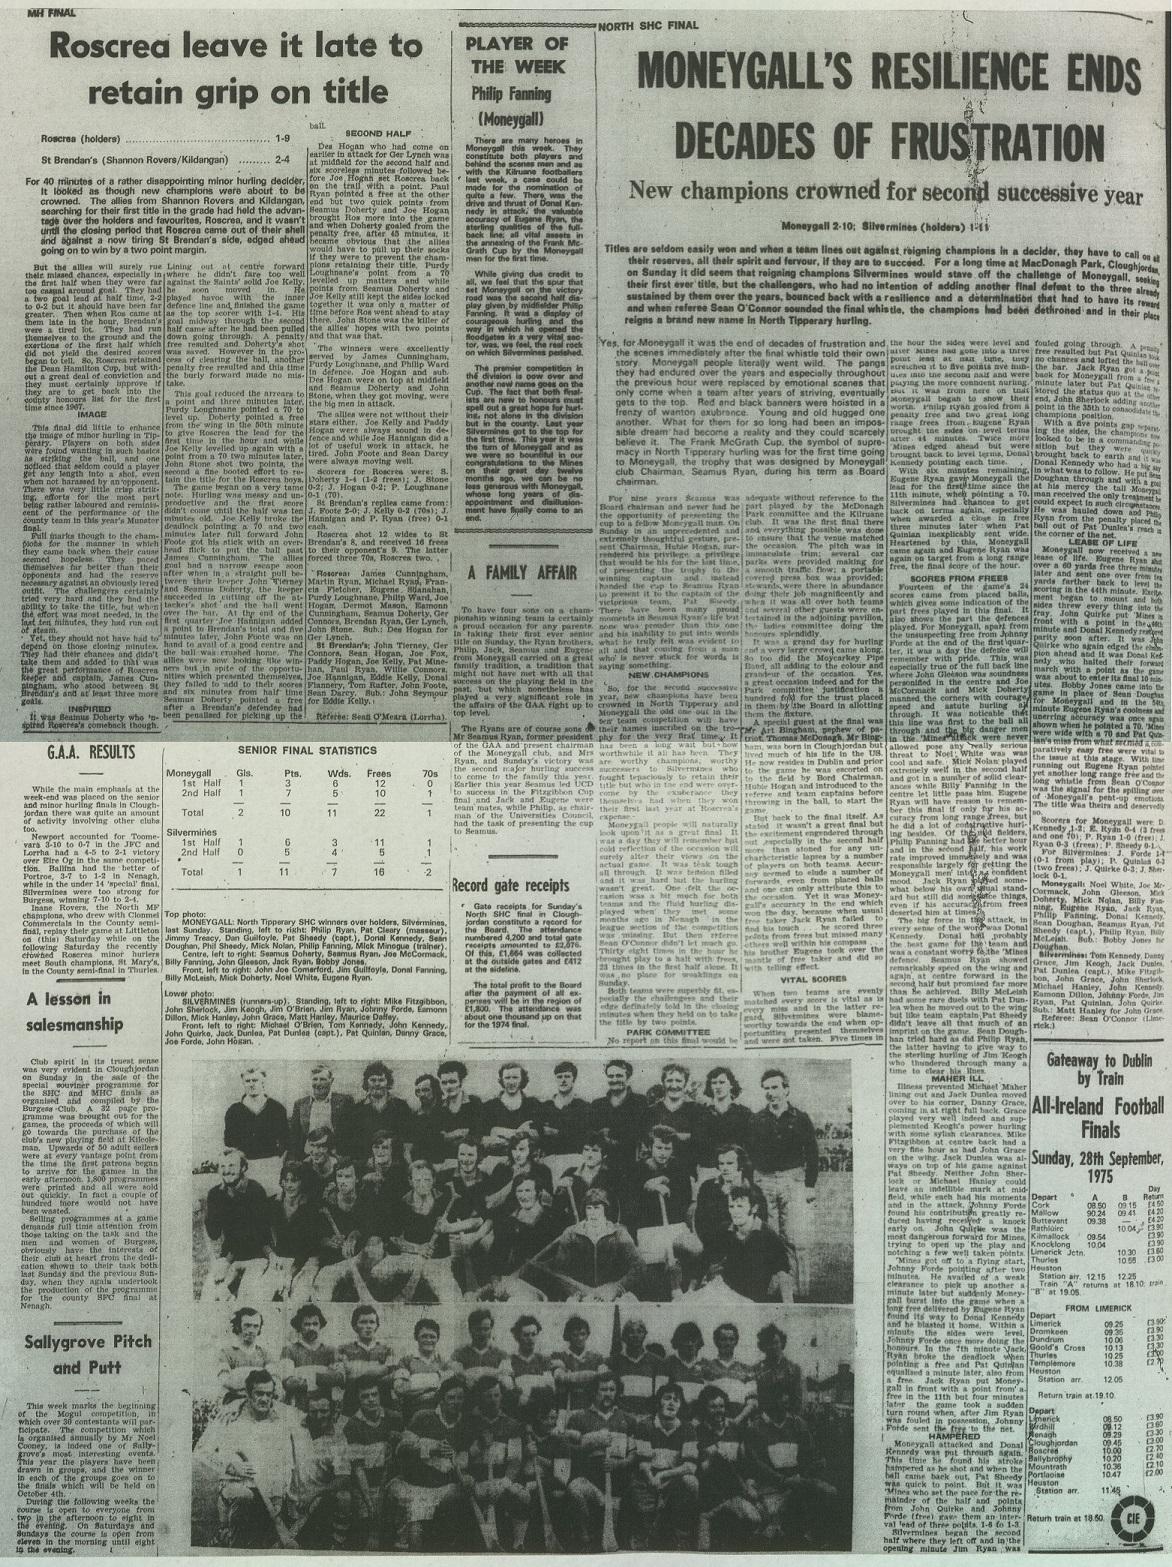 1975 North hurling final